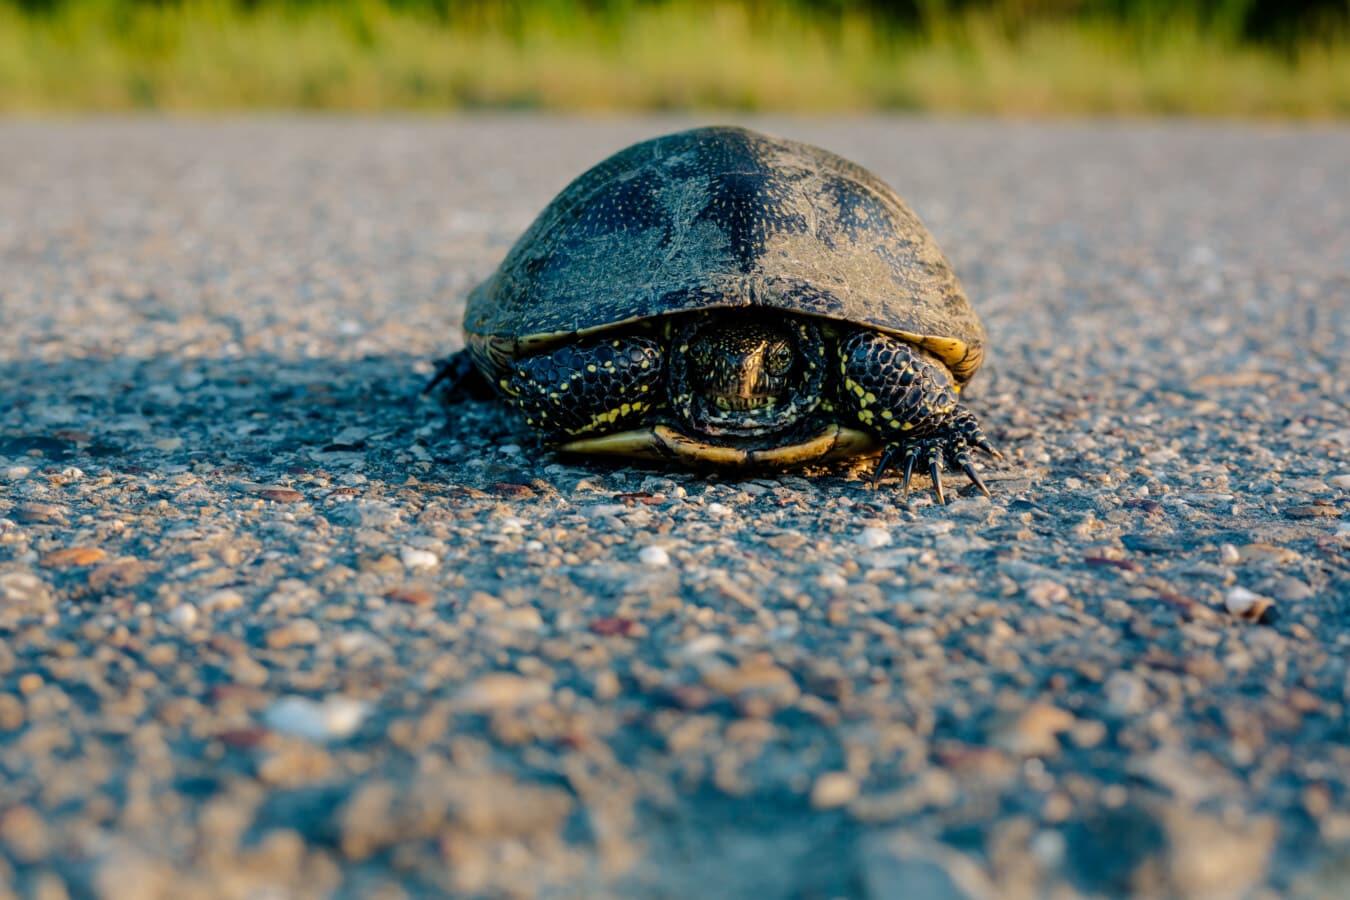 turtle, asphalt, road, invertebrate, animal, shell, reptile, garden, natural, vertebrate